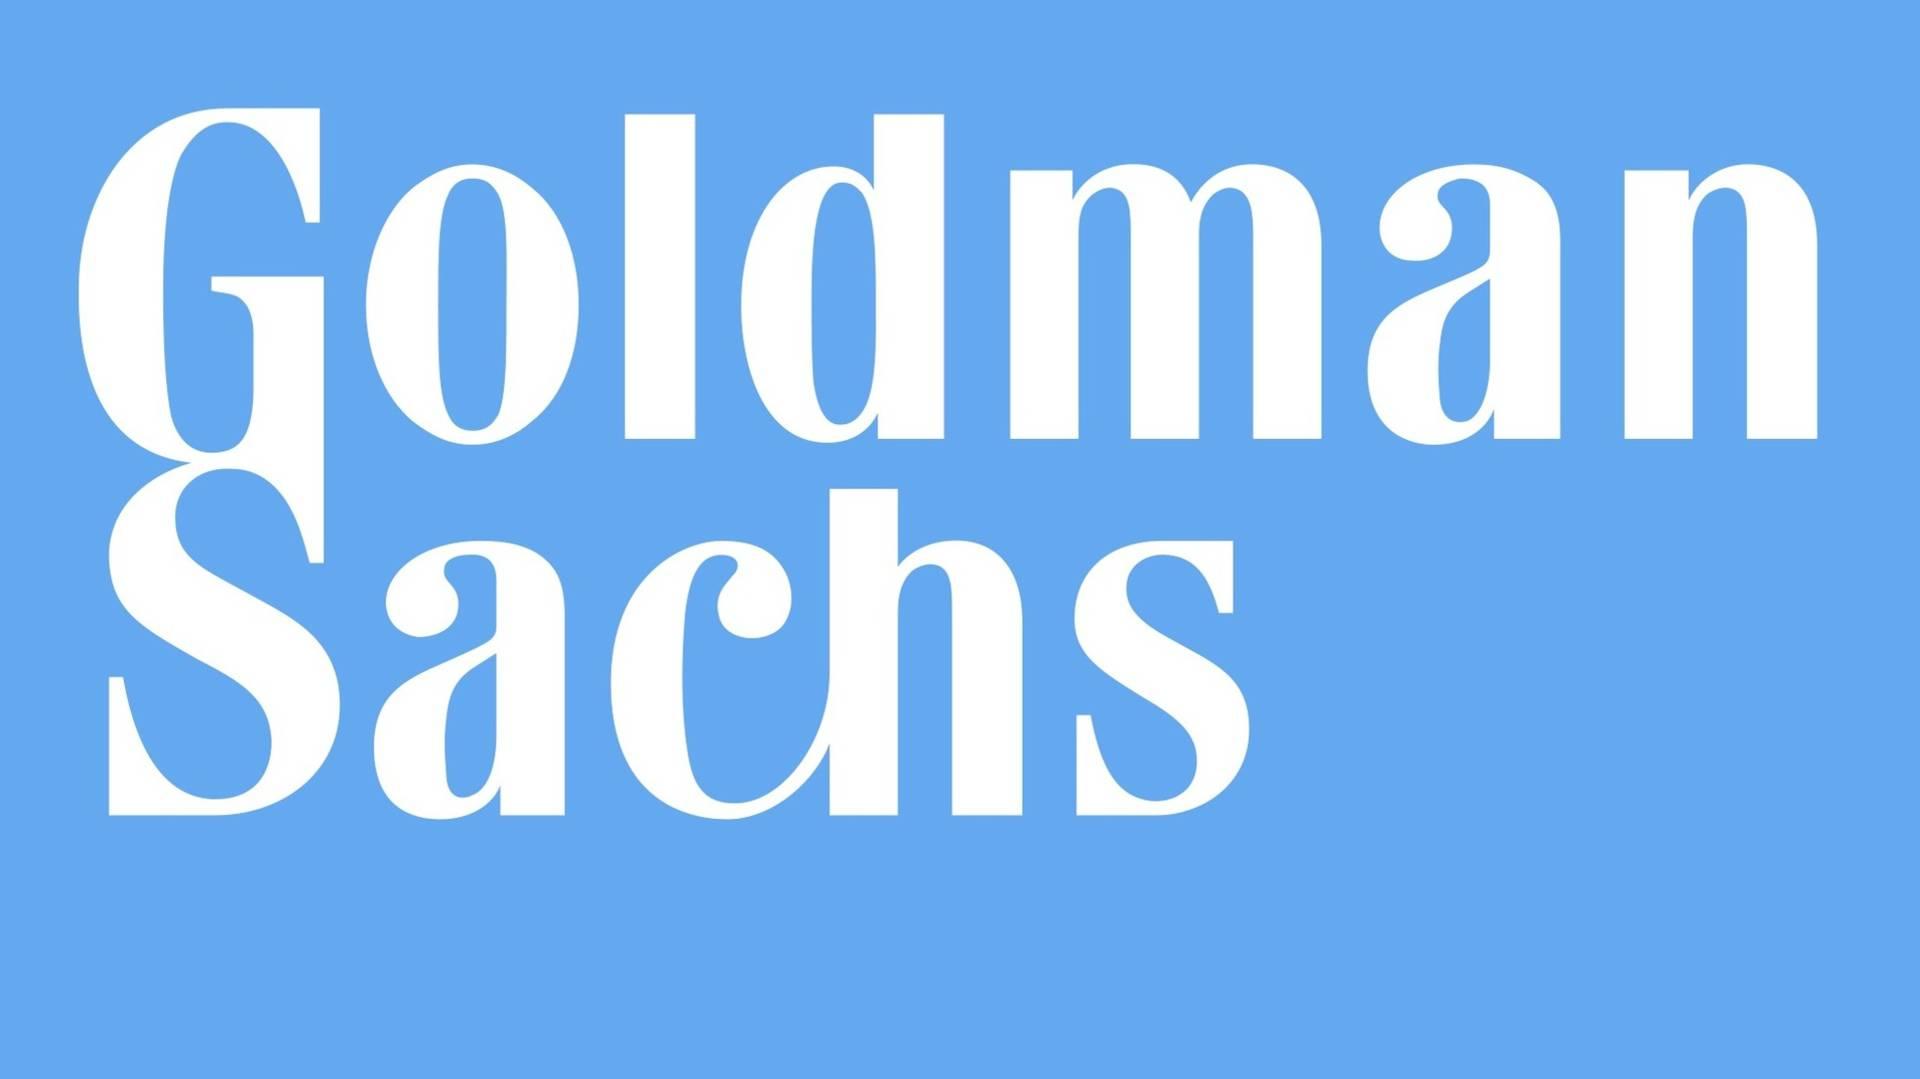 Principales bancos de Estados Unidos: Goldman Sachs Group